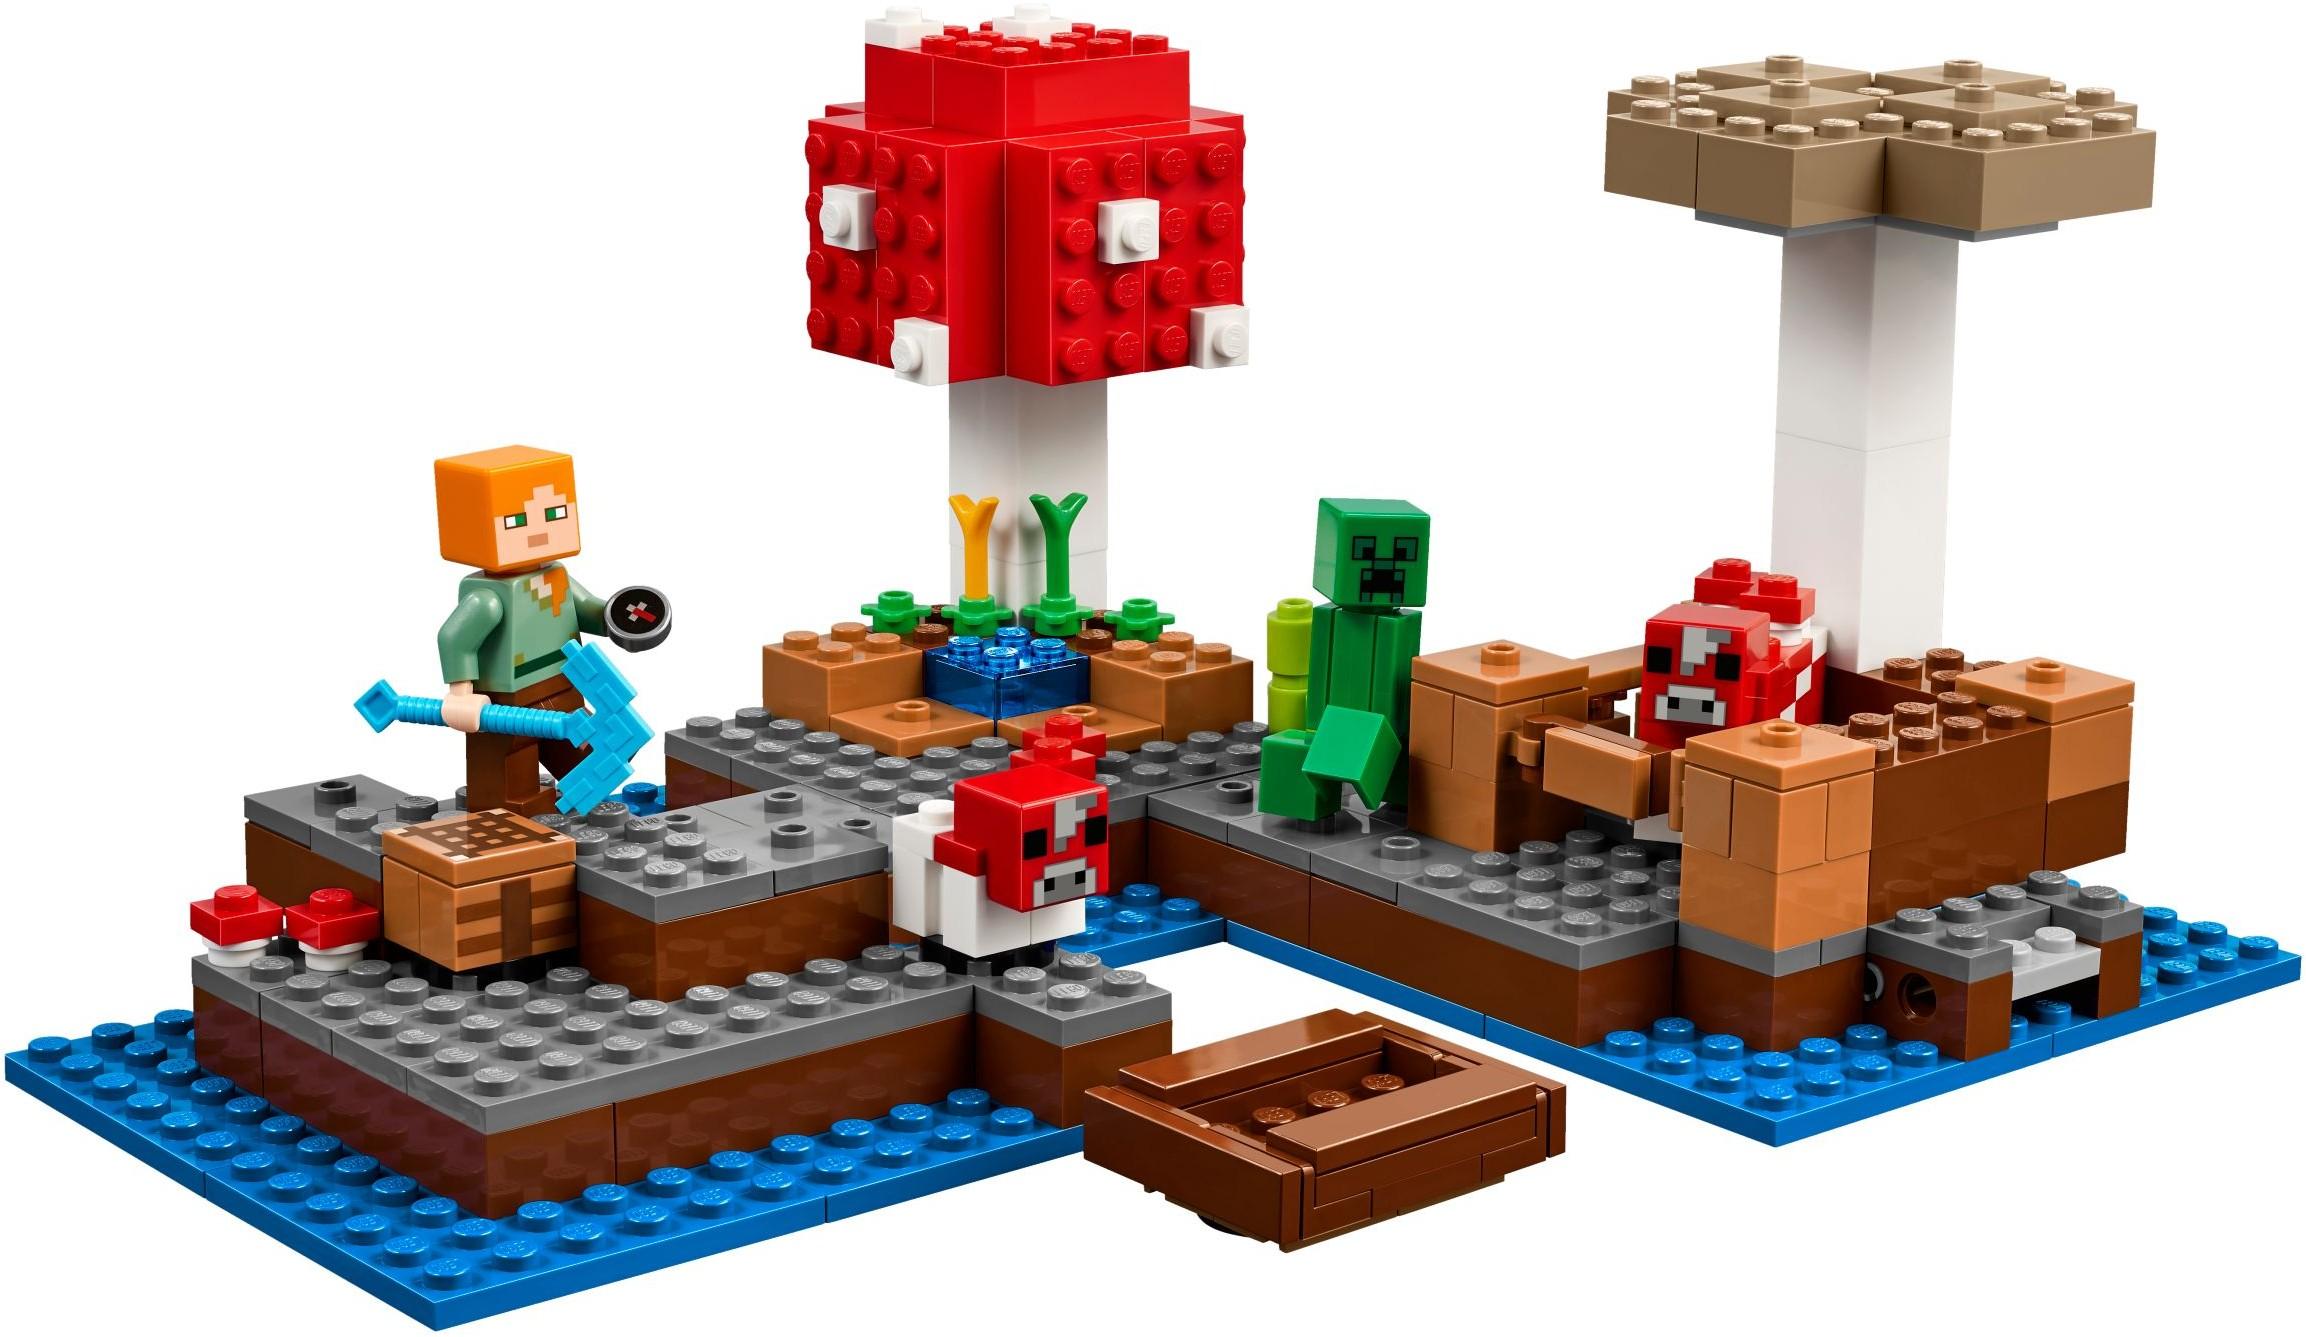 21129 LEGO Minecraft™ The Mushroom Island